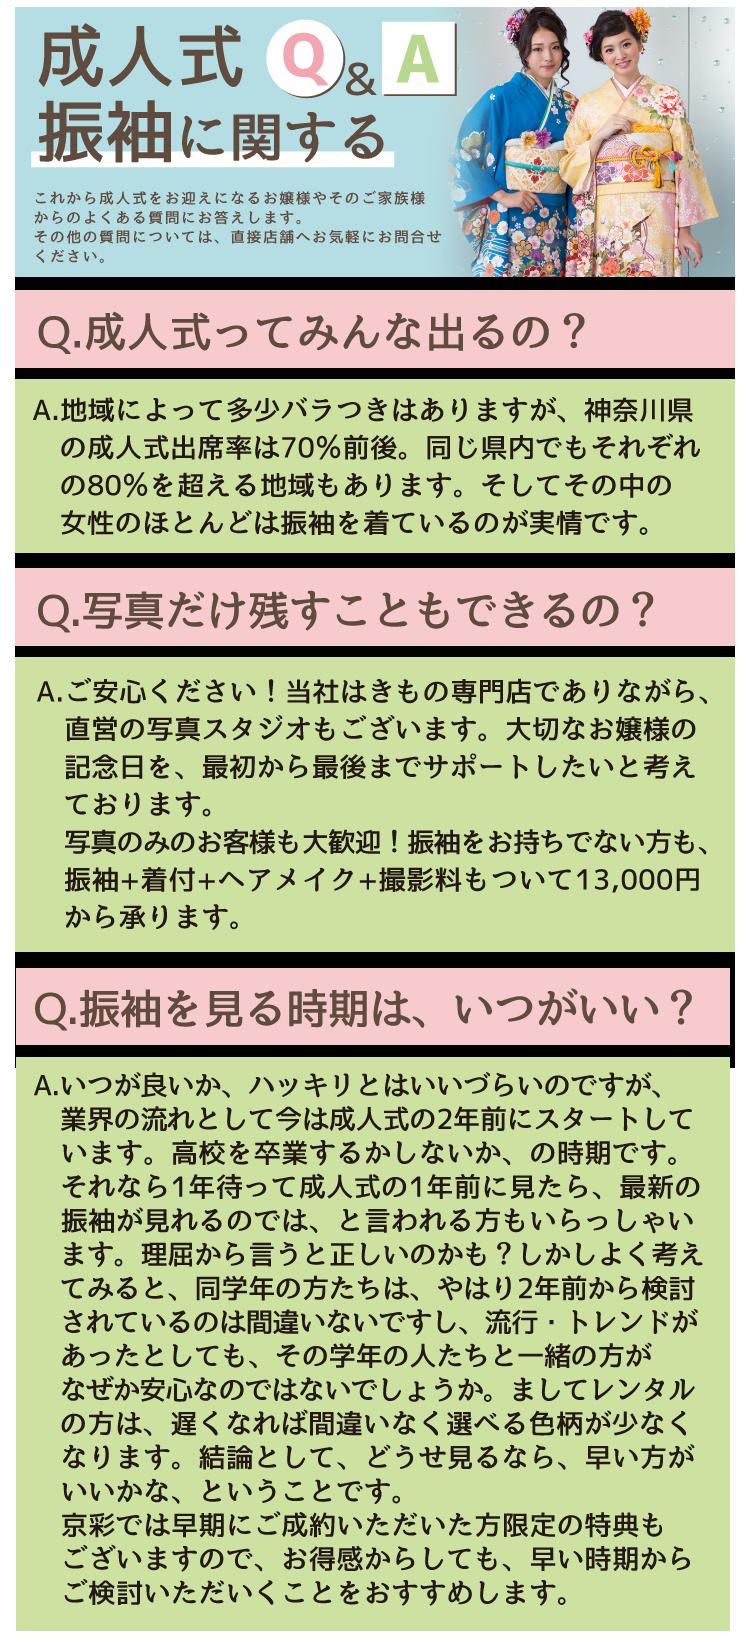 seijinsiki_q&a